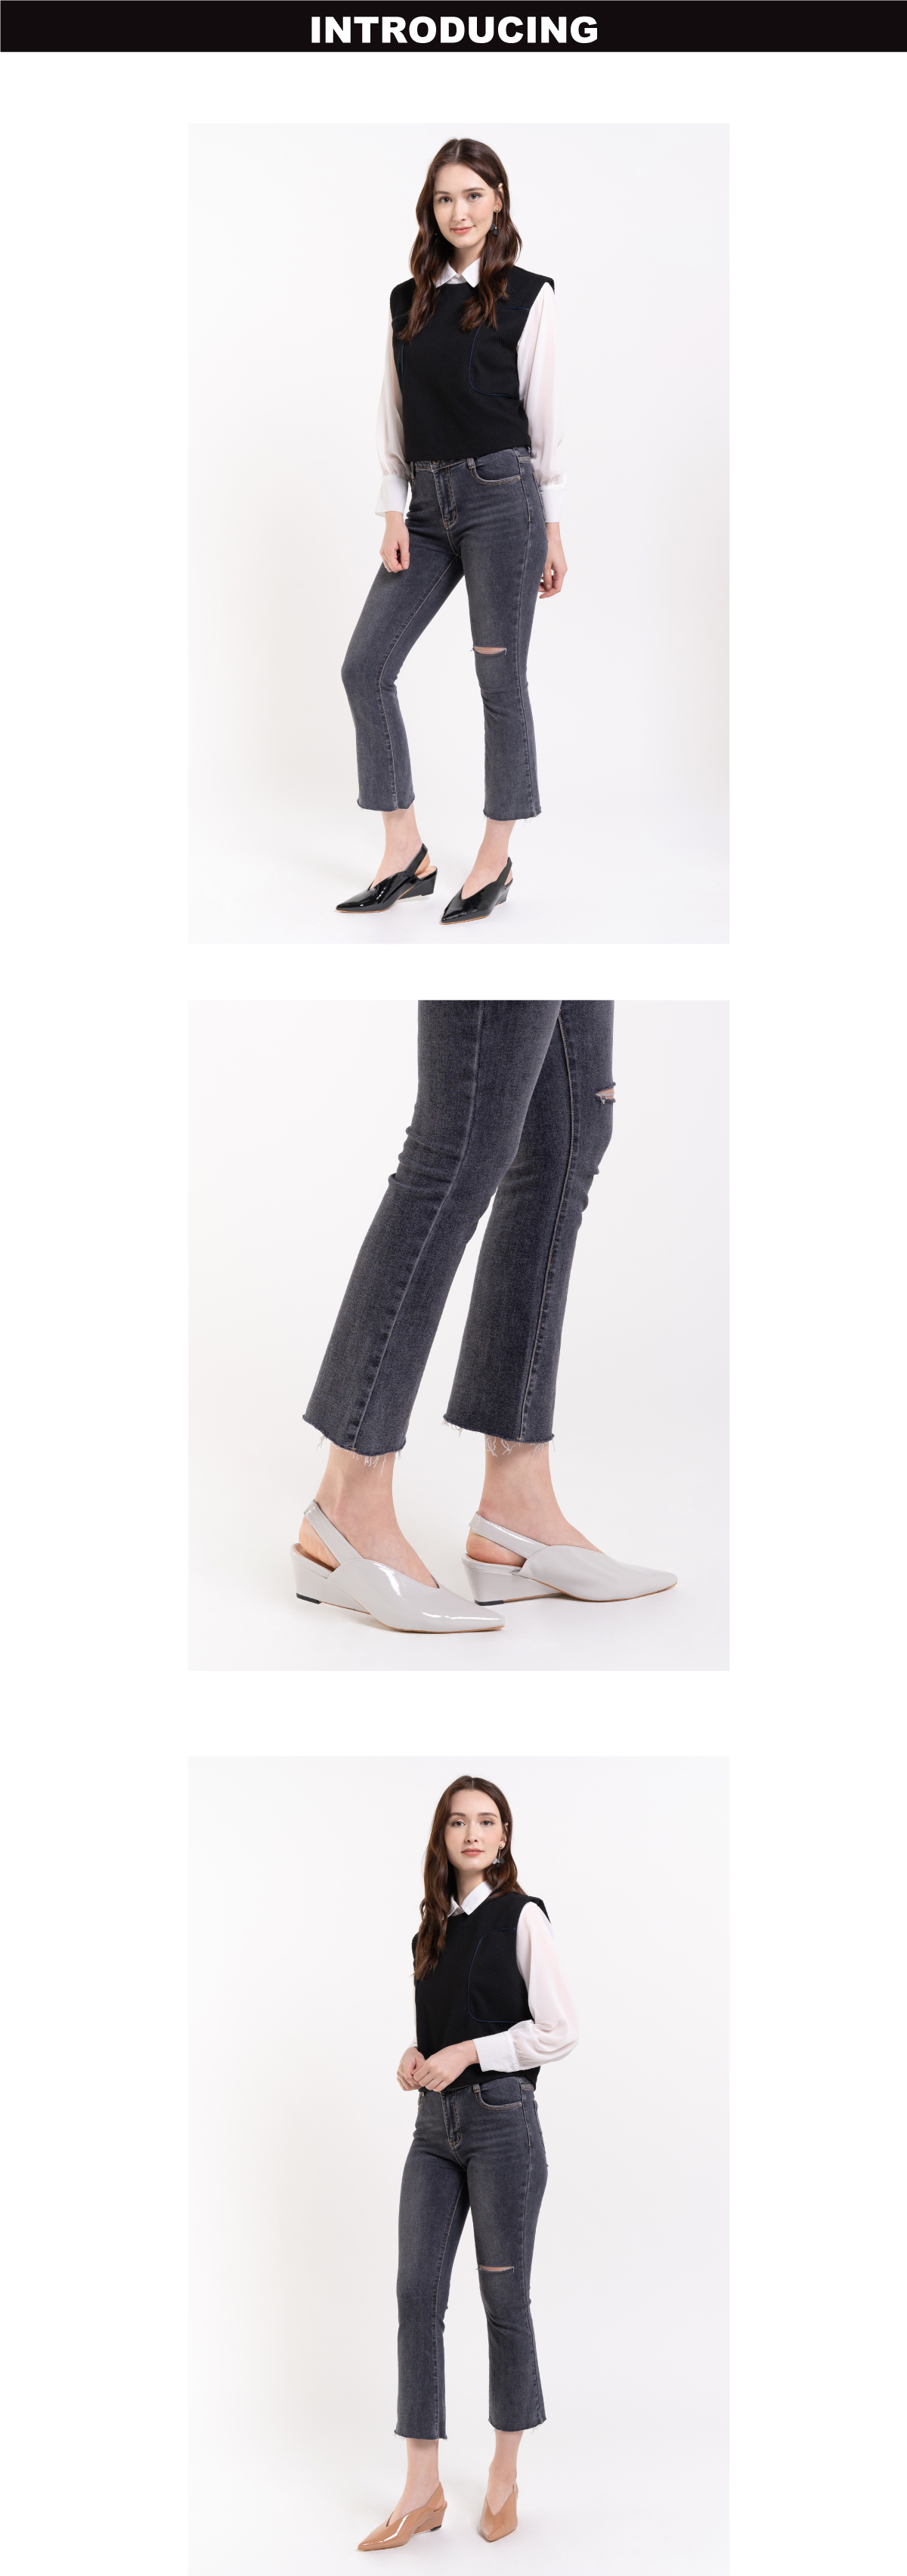 "33310 J005 1 - 2"" Glossy Sandy Slingback Heels"